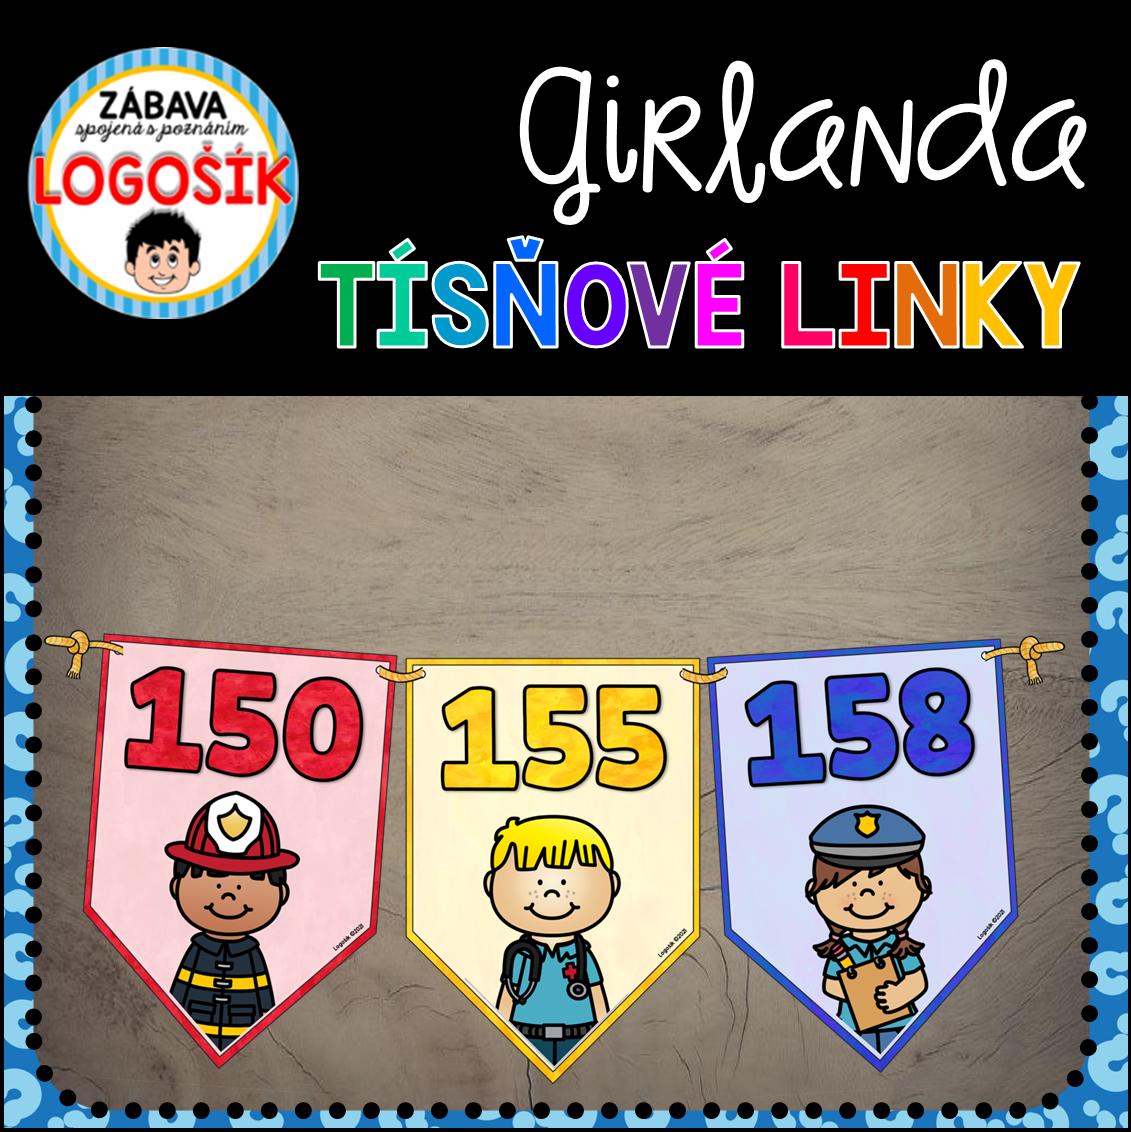 Girlanda - tísňové linky